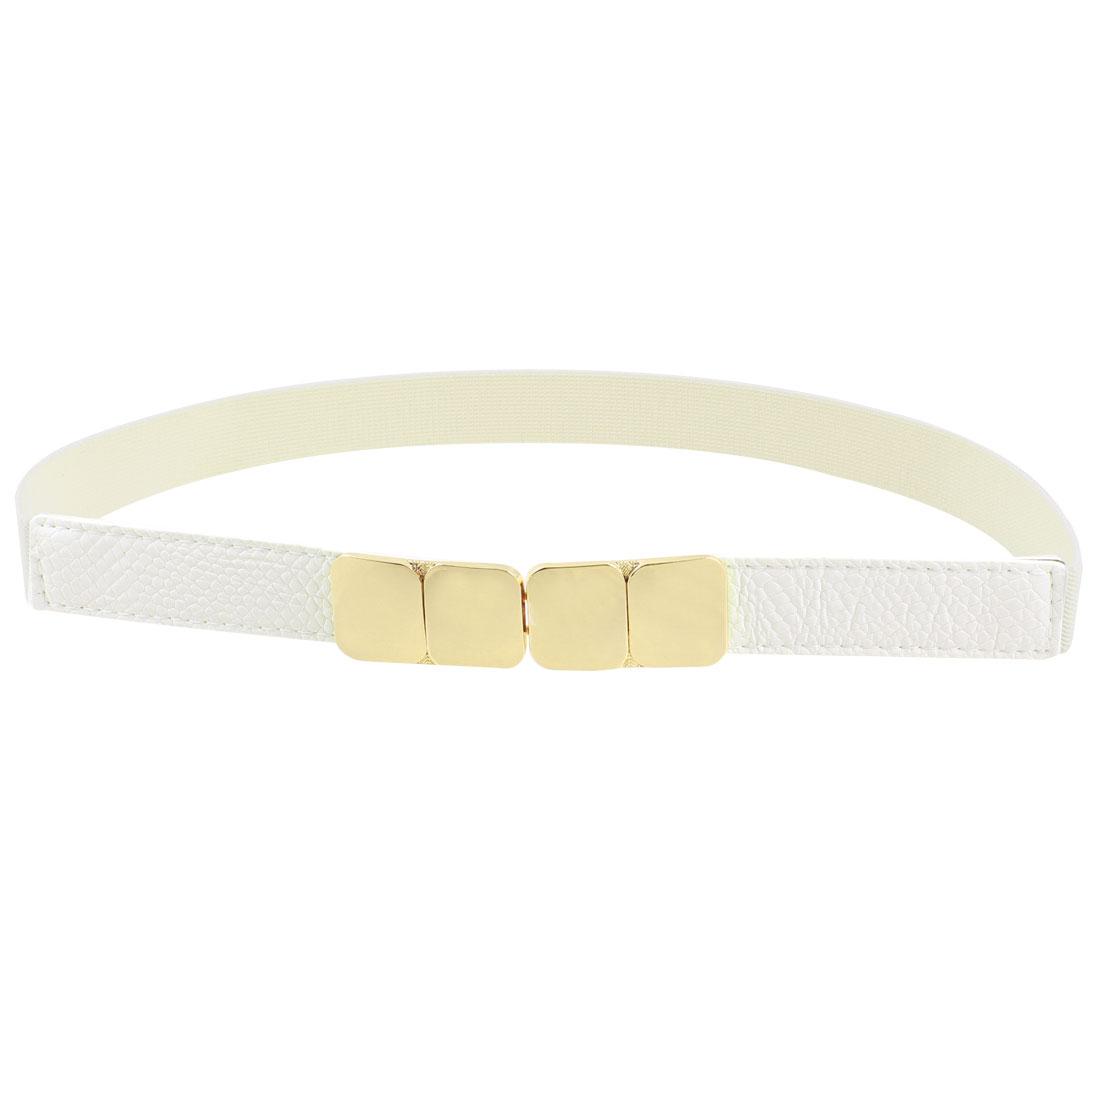 Metal Interlocking Buckle Stretchy Skirt Waistband Waistbelt White for Ladies Girl